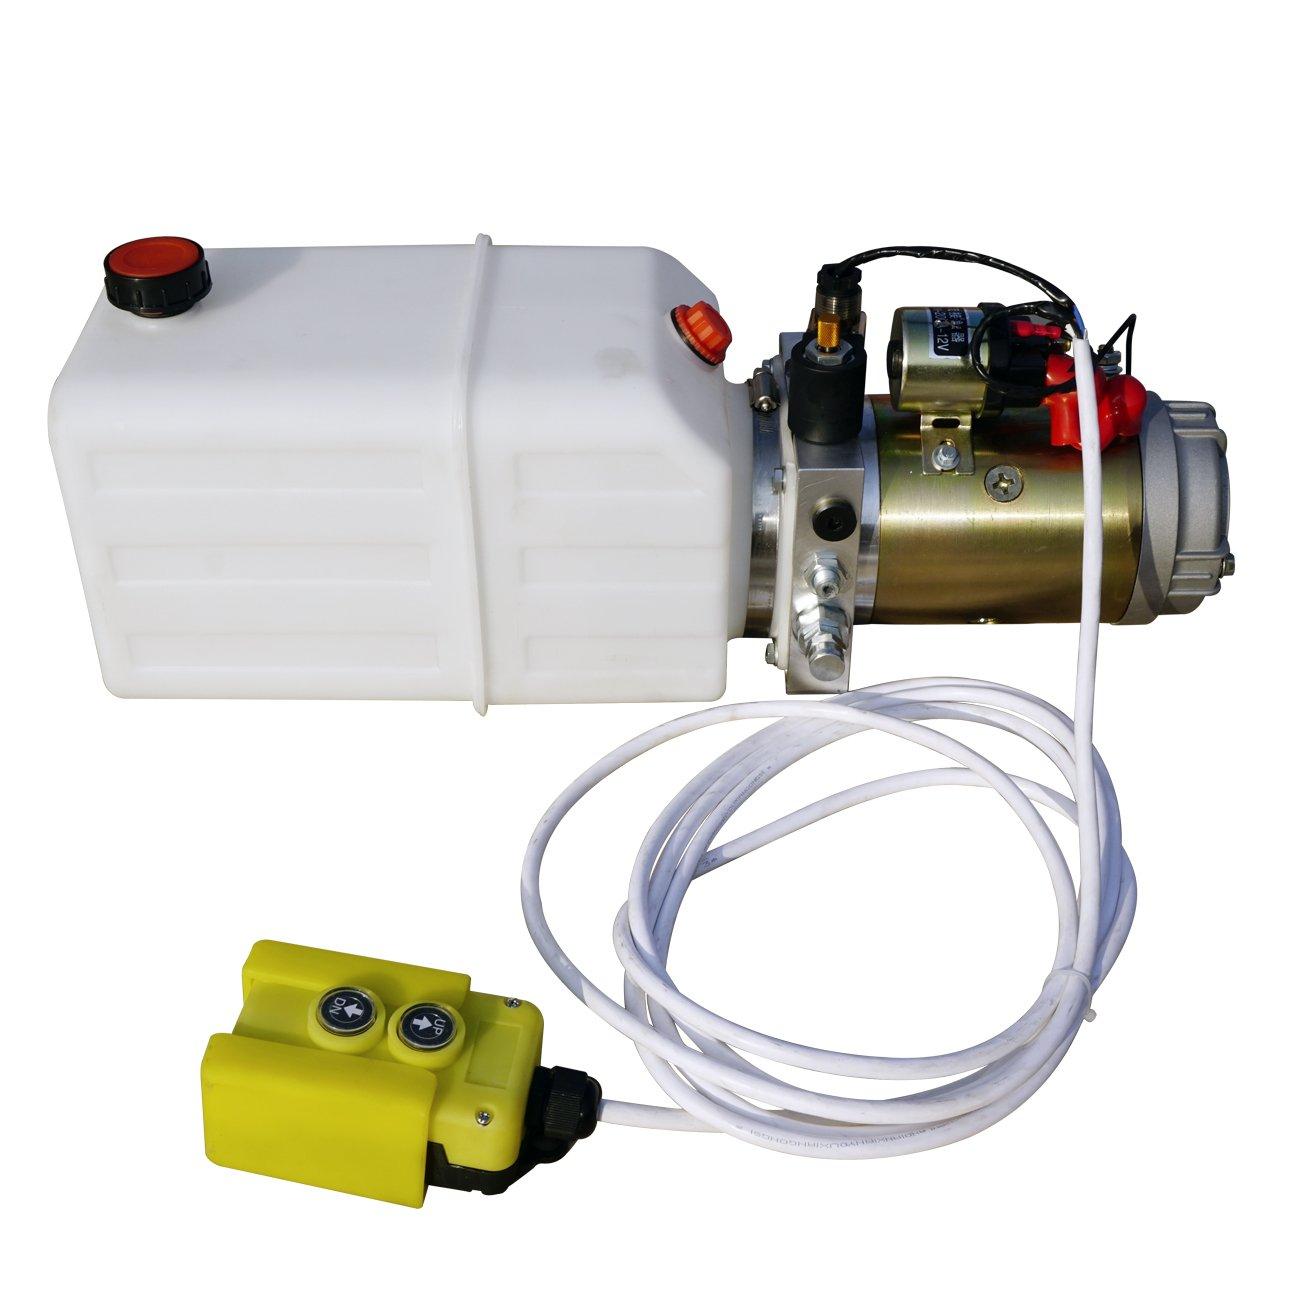 ECO-WORTHY 8L双相 オイルポンプ駆動油圧式ユニット B01ERD72BA 8L双相  8L双相